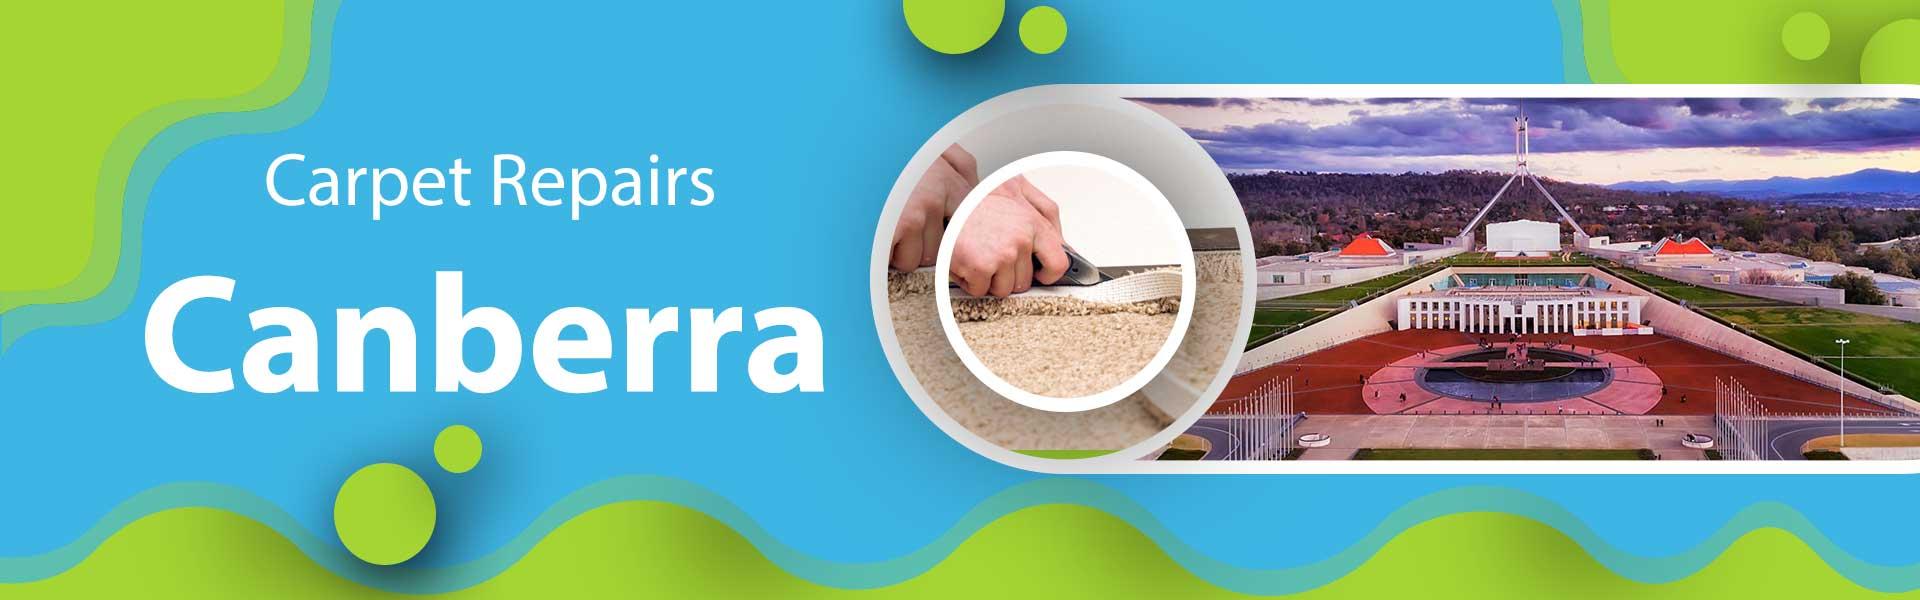 Carpet Repairs Canberra